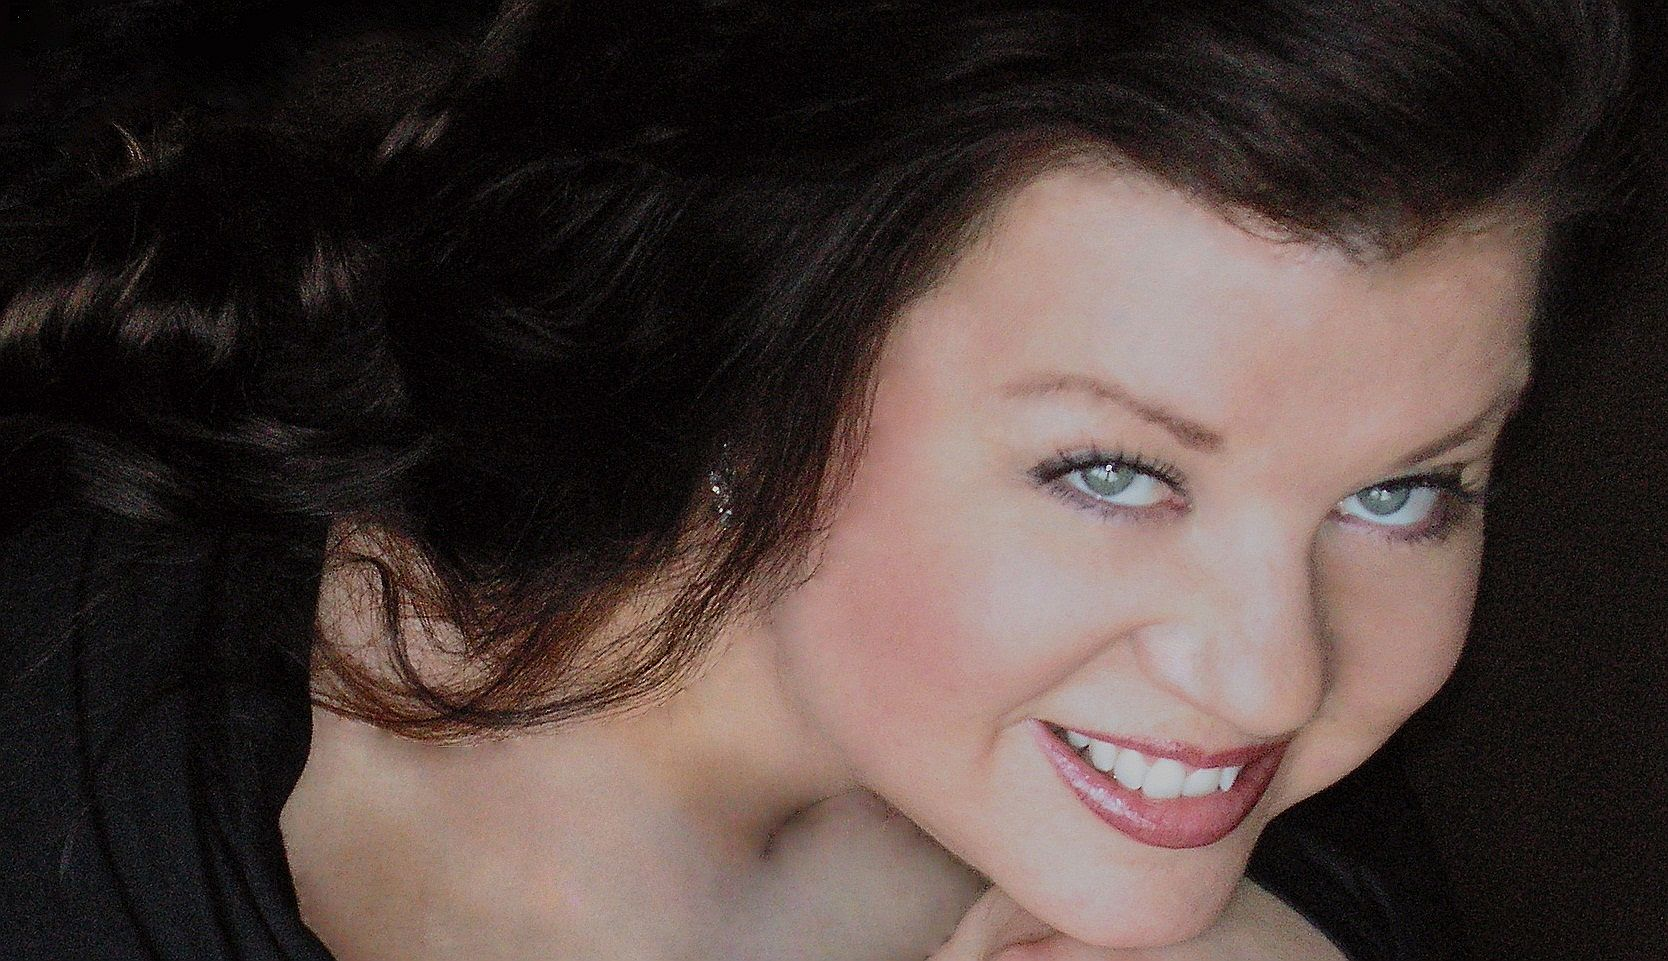 Paula Harris Horizontal Format Headshot 2011